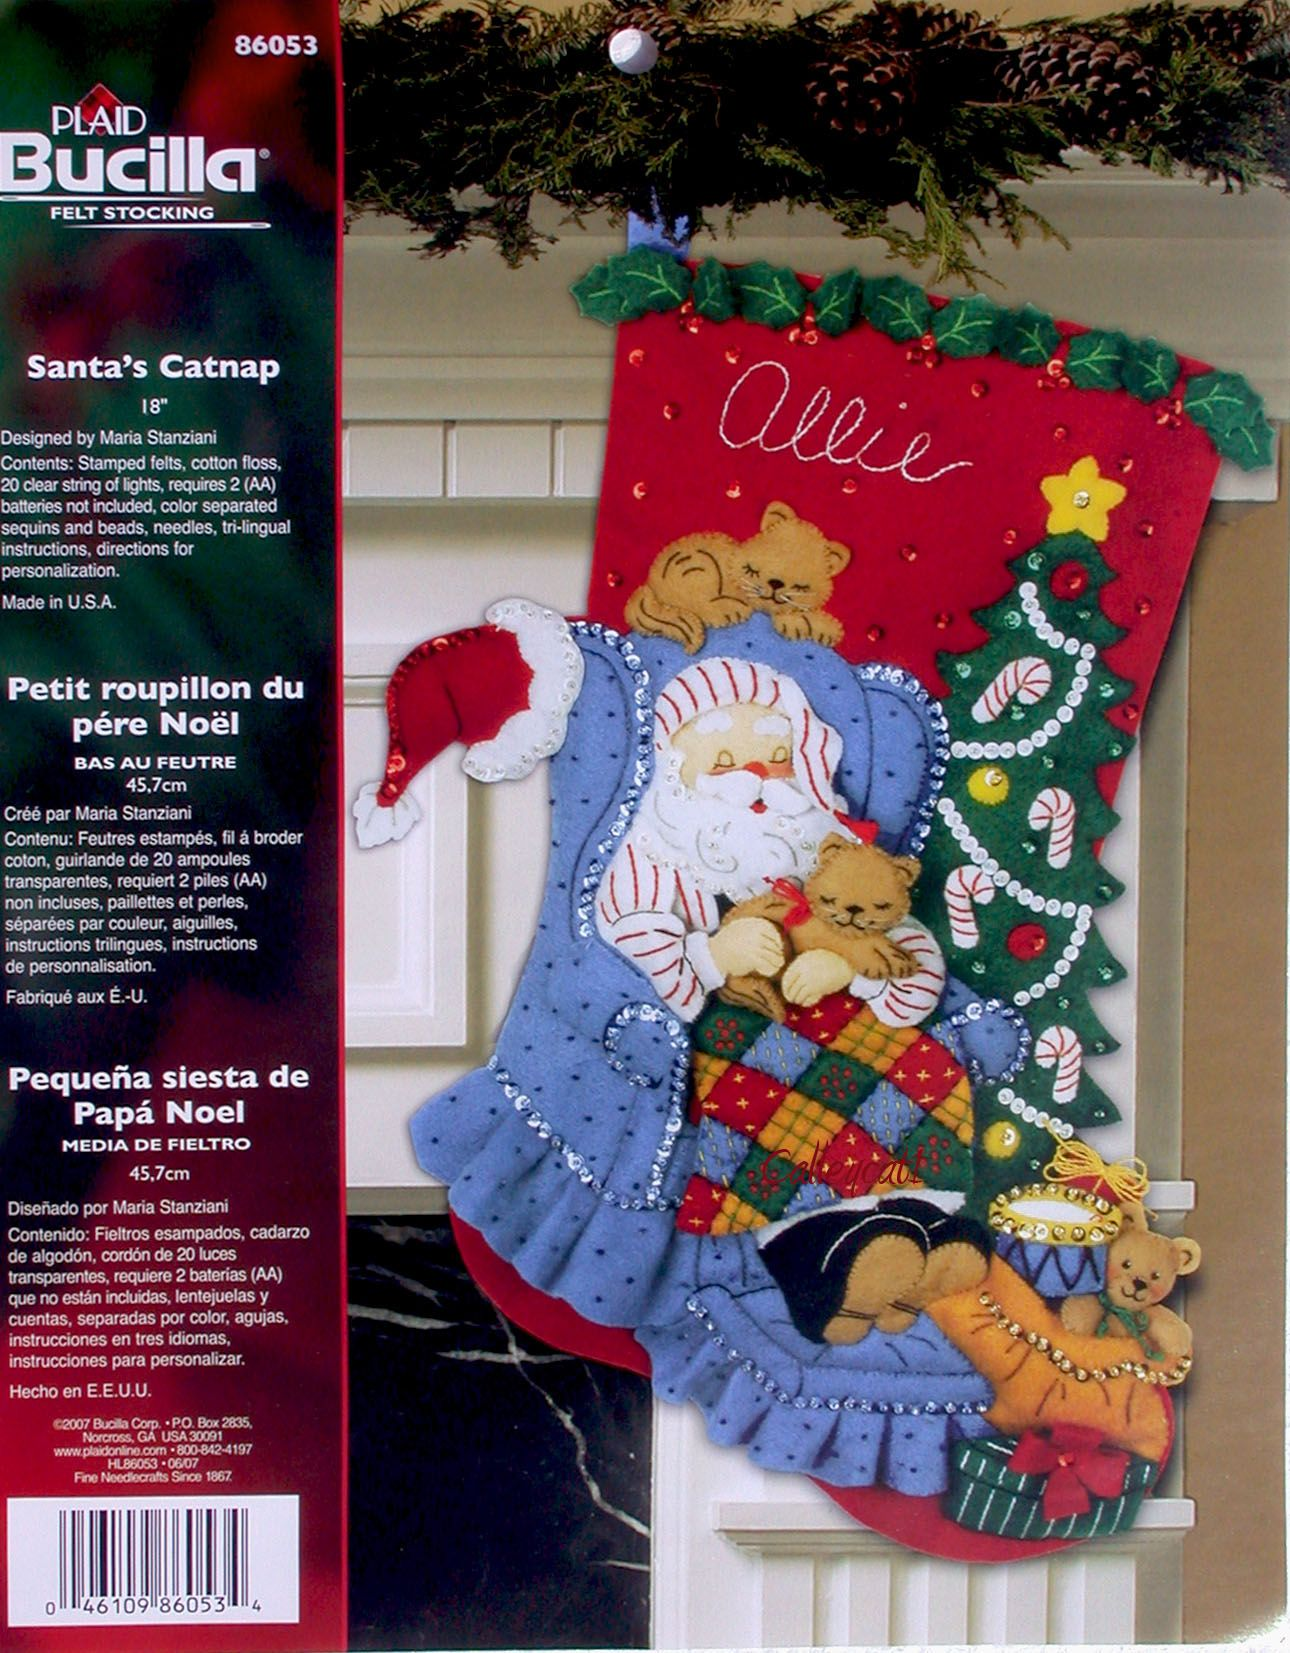 Santa S Catnap 18 Bucilla Felt Christmas Stocking Kit 86053